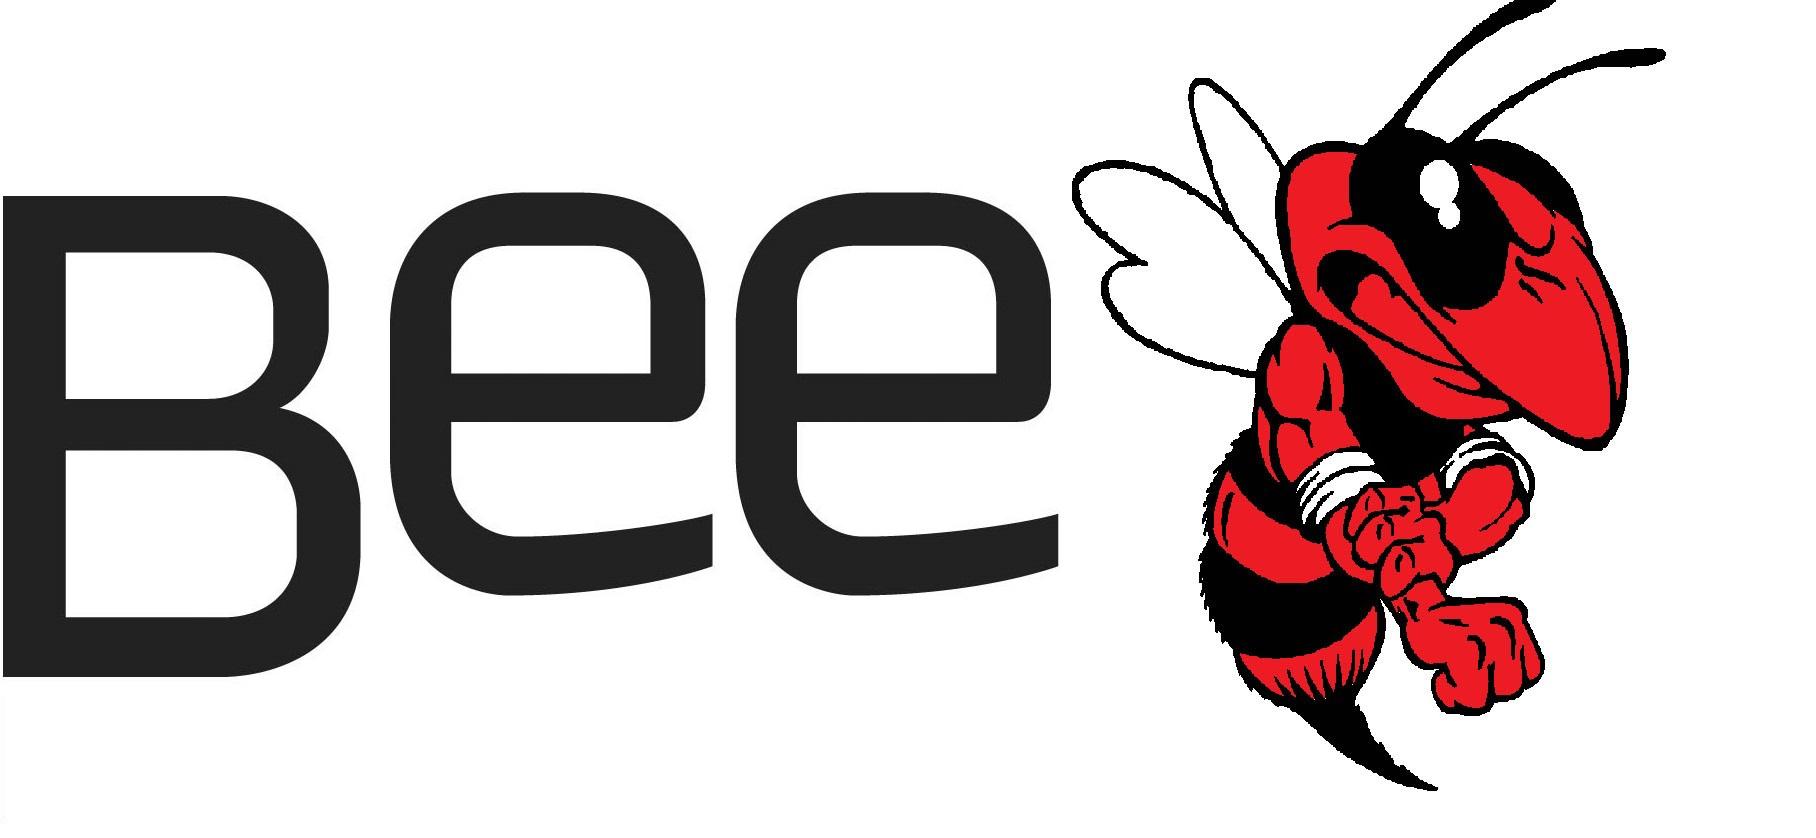 Bee PC